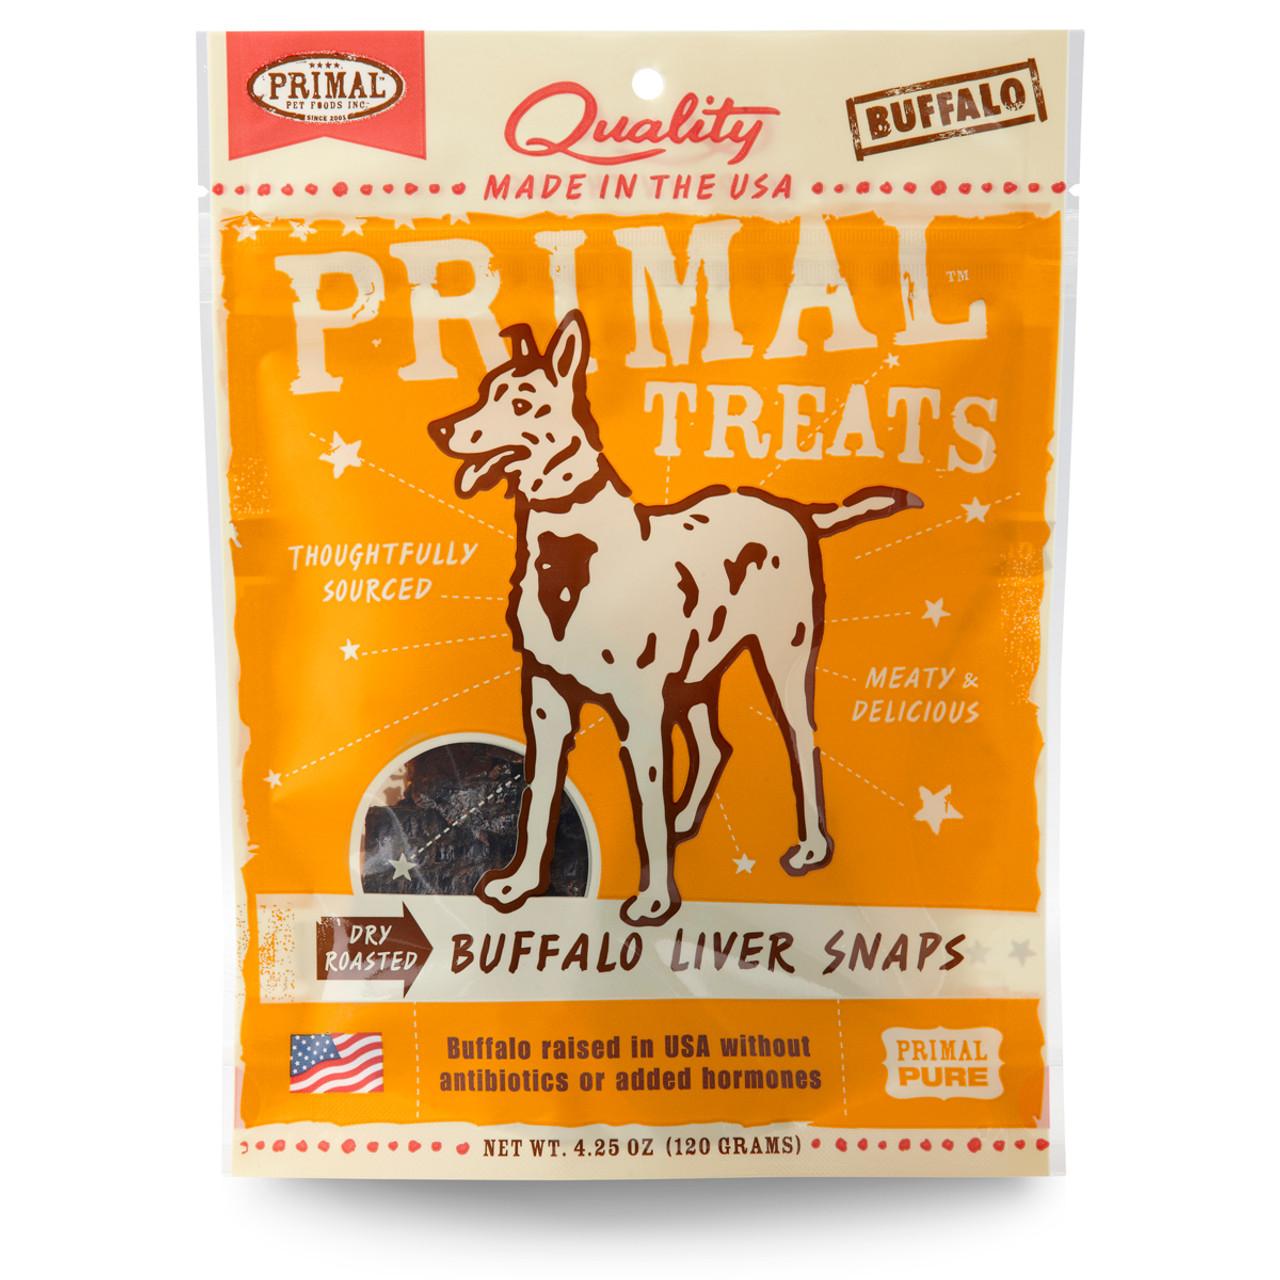 Primal Dry Roasted Buffalo Liver Snaps Dog Treats